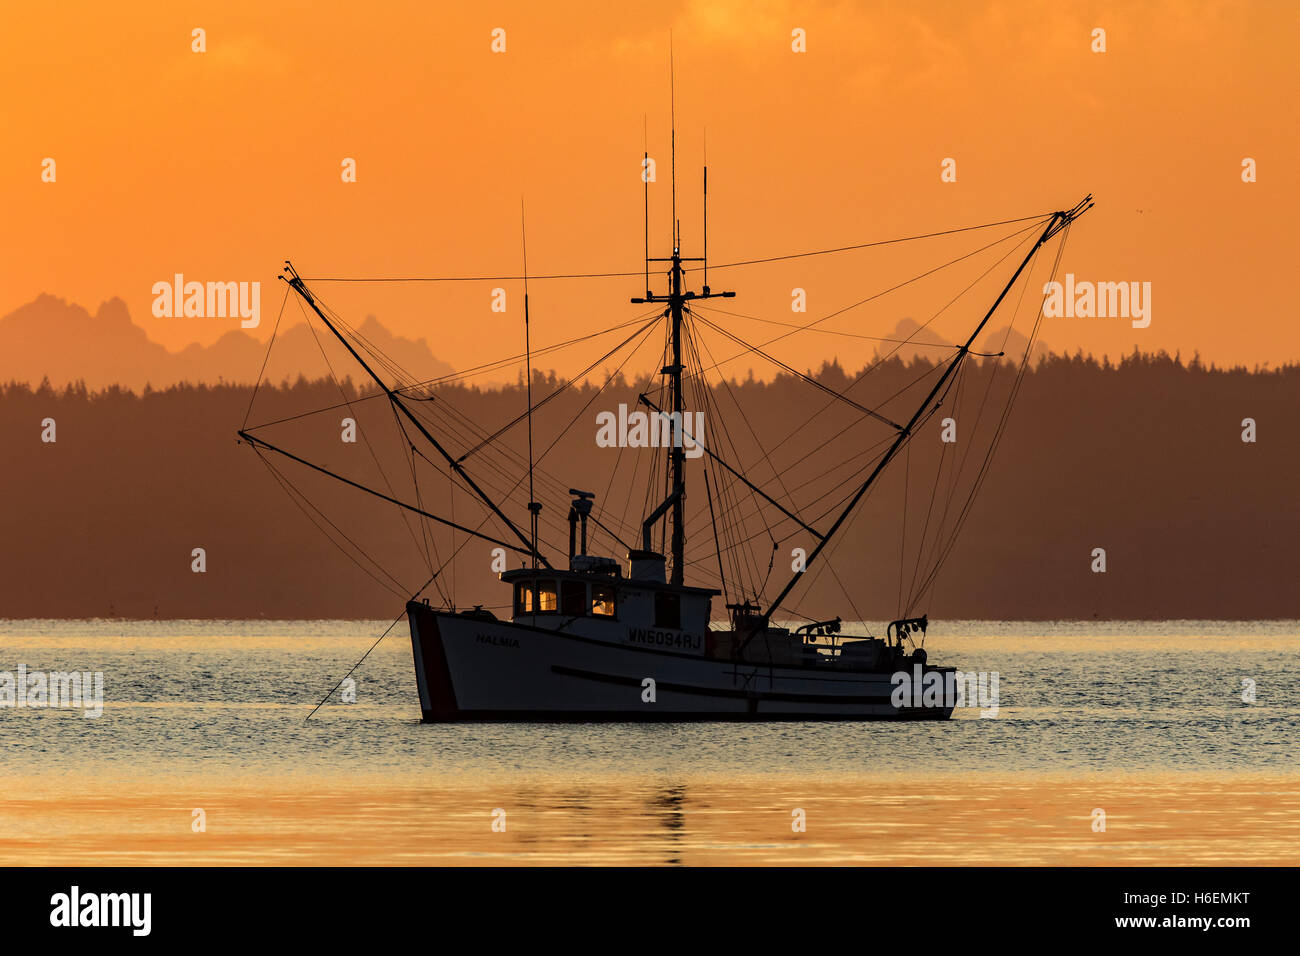 Fischerboot troller vor Anker bei Sonnenaufgang in Port Townsend, Puget Sound. Lachs angeln Boot. Stockbild